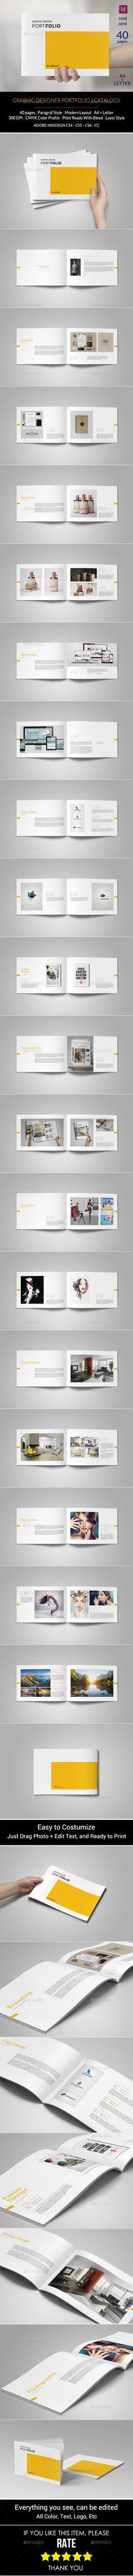 Portfolio Template - Portfolio Brochure InDesign INDD. Download here: http://graphicriver.net/item/portfolio-template/13031098?s_rank=1797&ref=yinkira